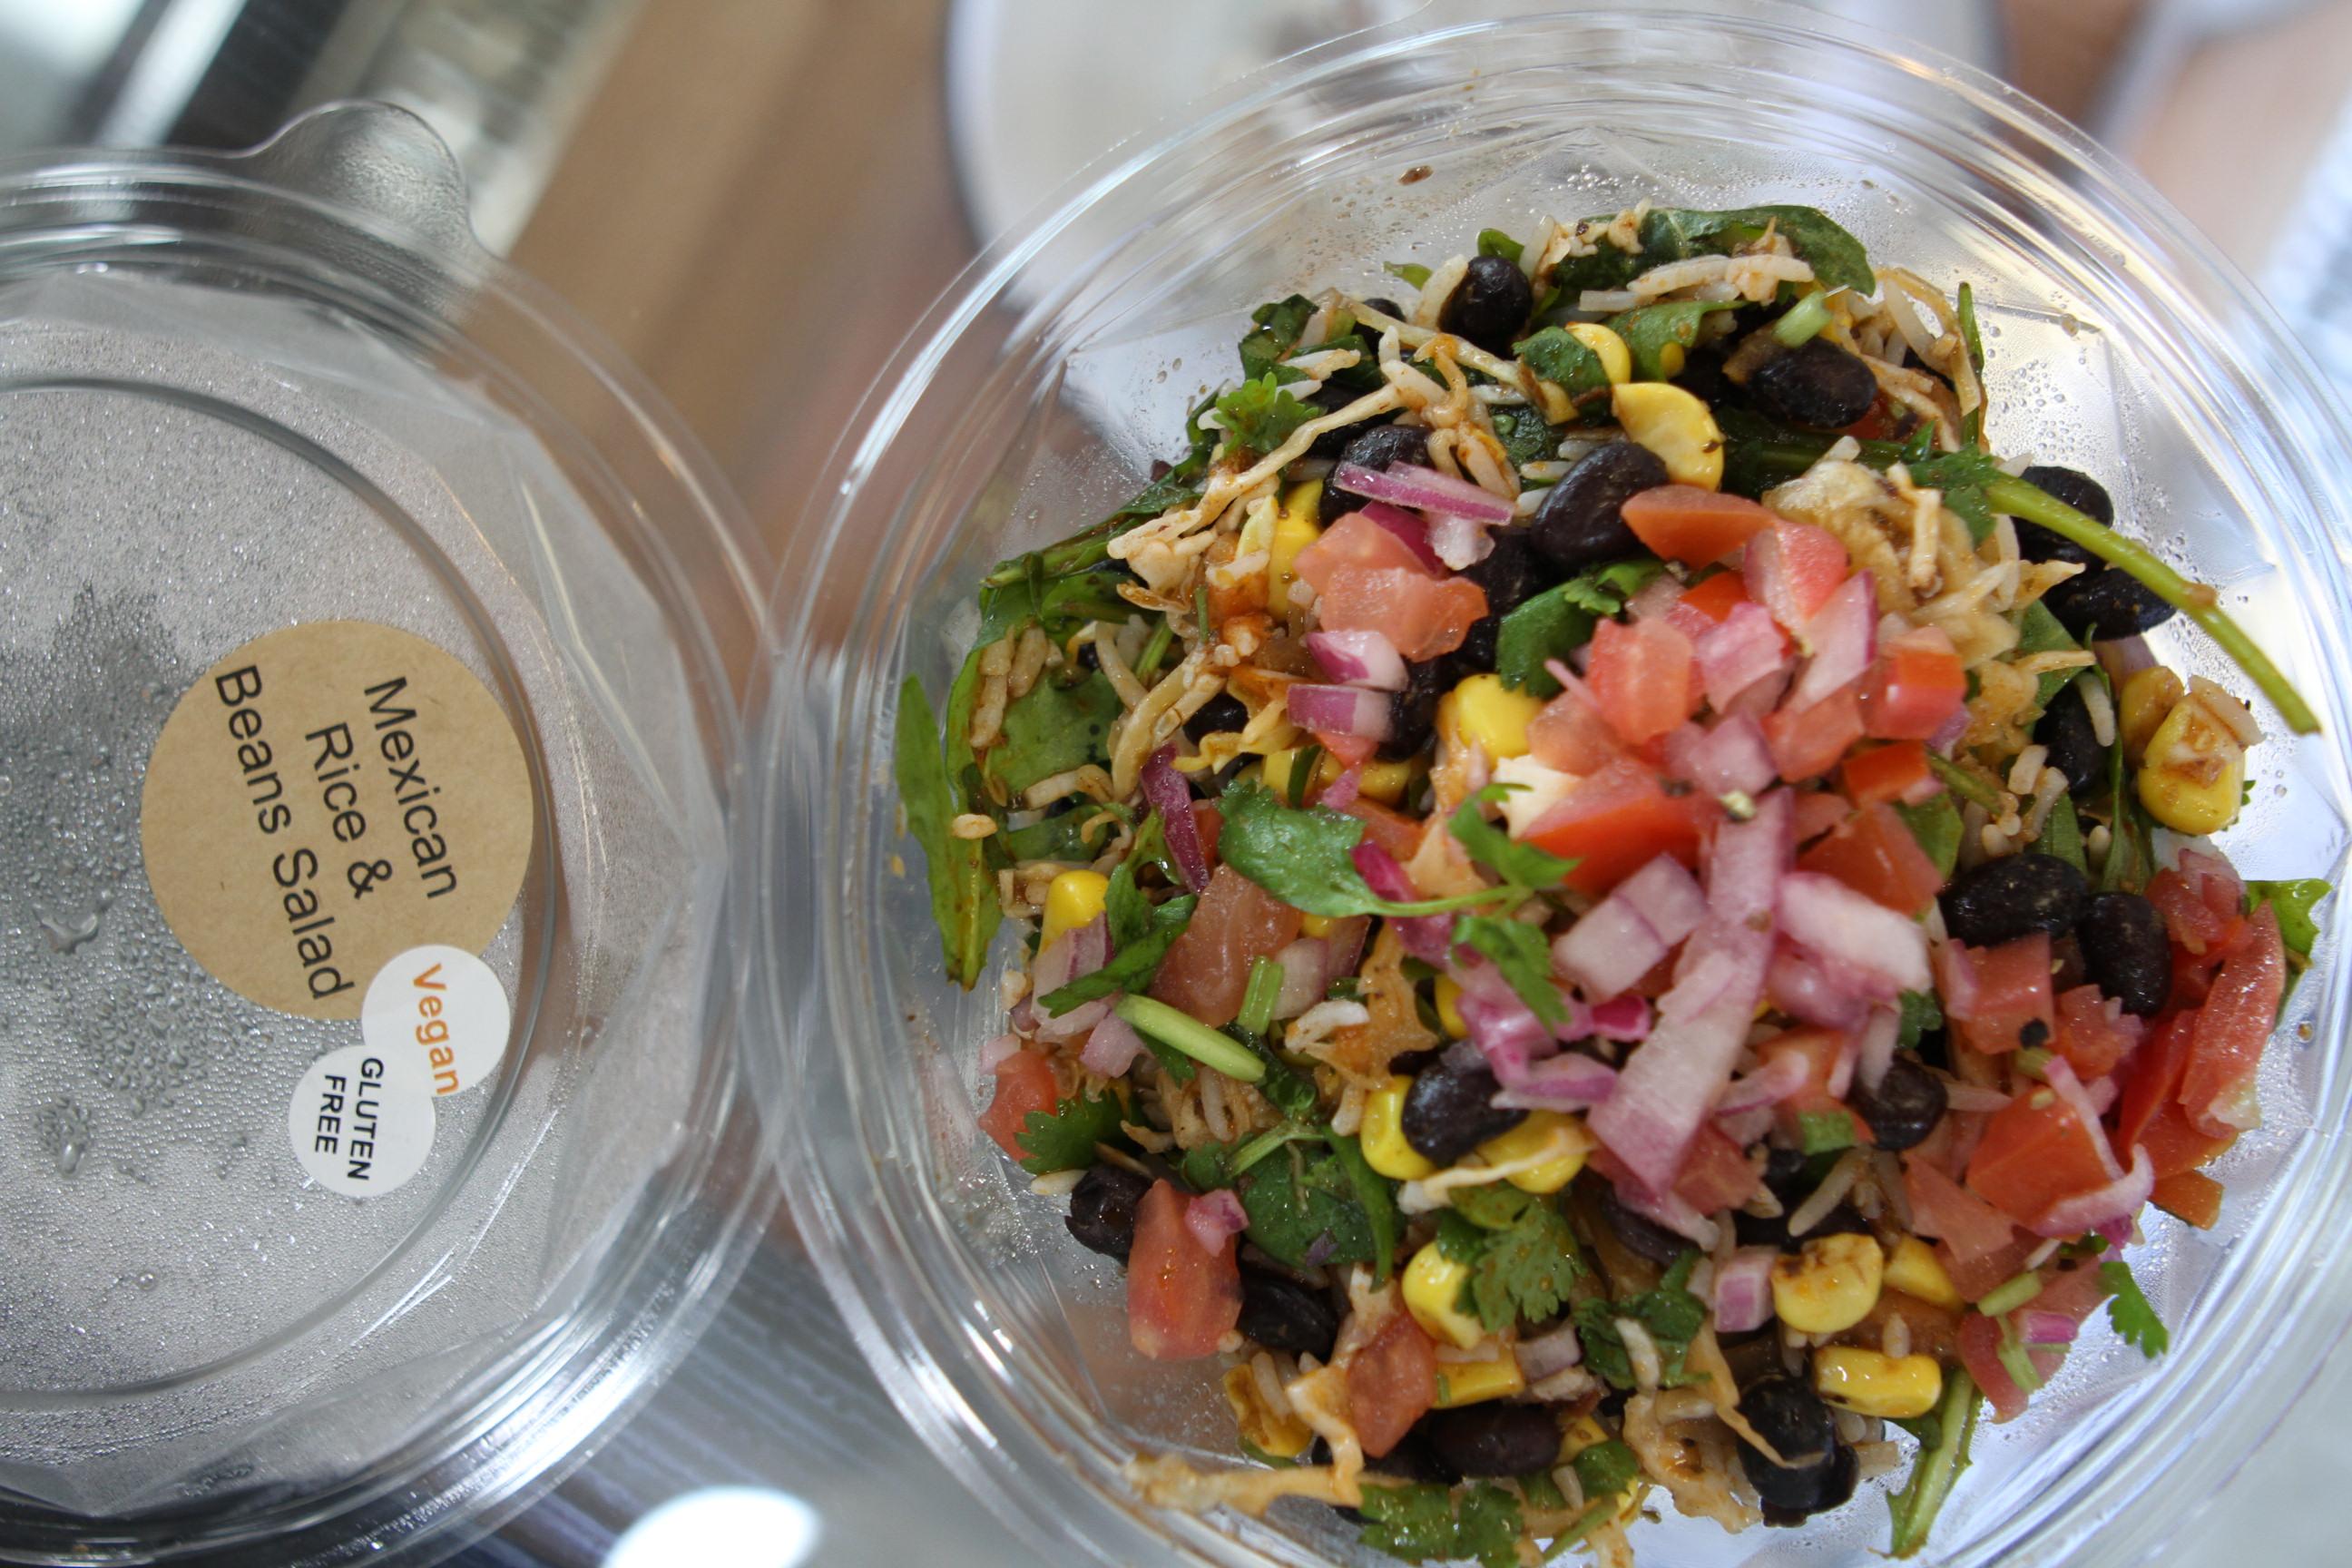 Nourishing Salad